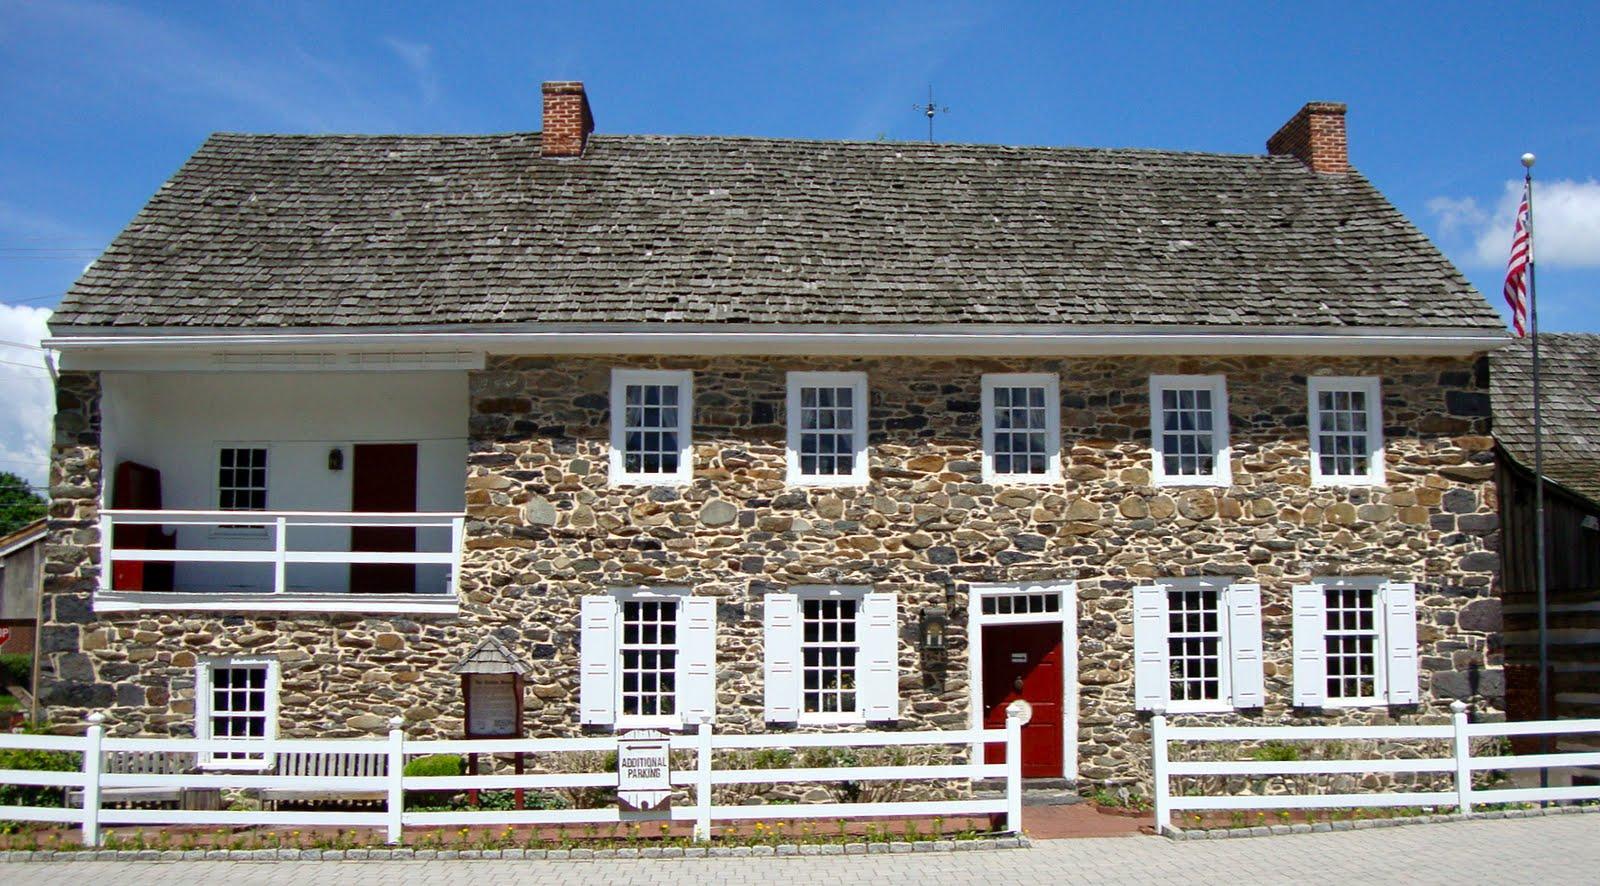 Dobbin house 28 images the dobbin house in gettysburg for Dobbins homes